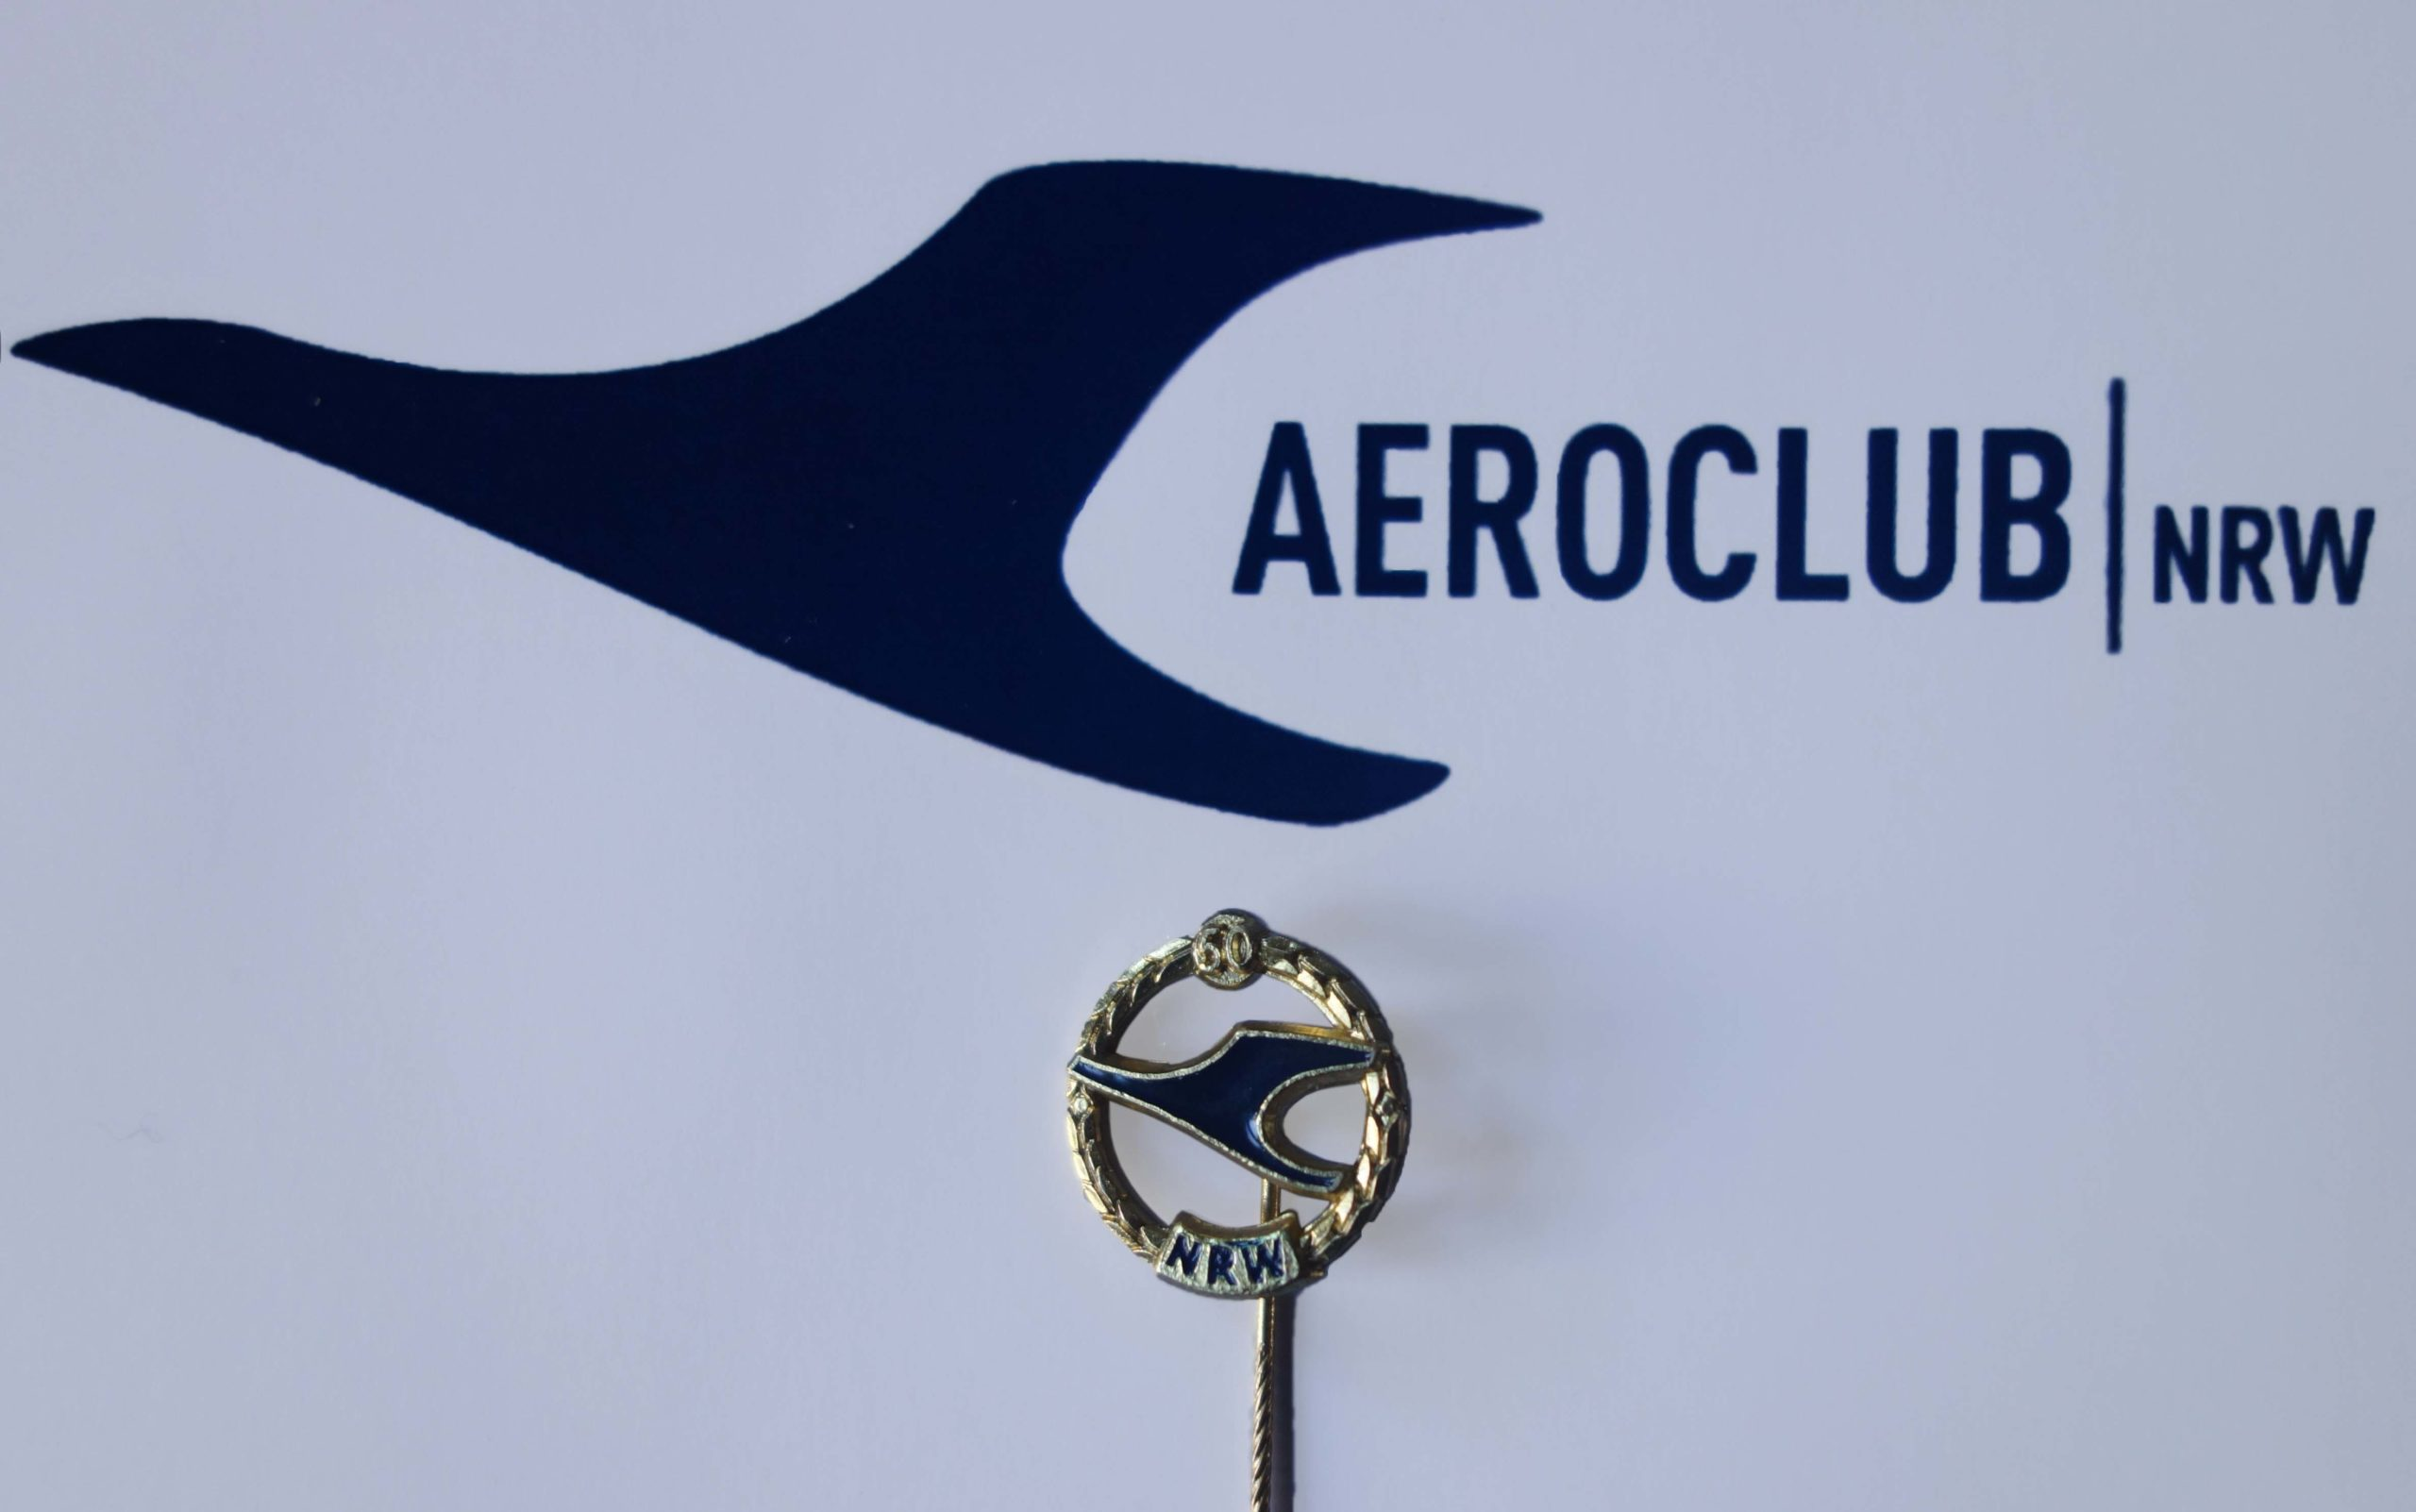 Goldene Ehrennadeln vom Aeroclub NRW